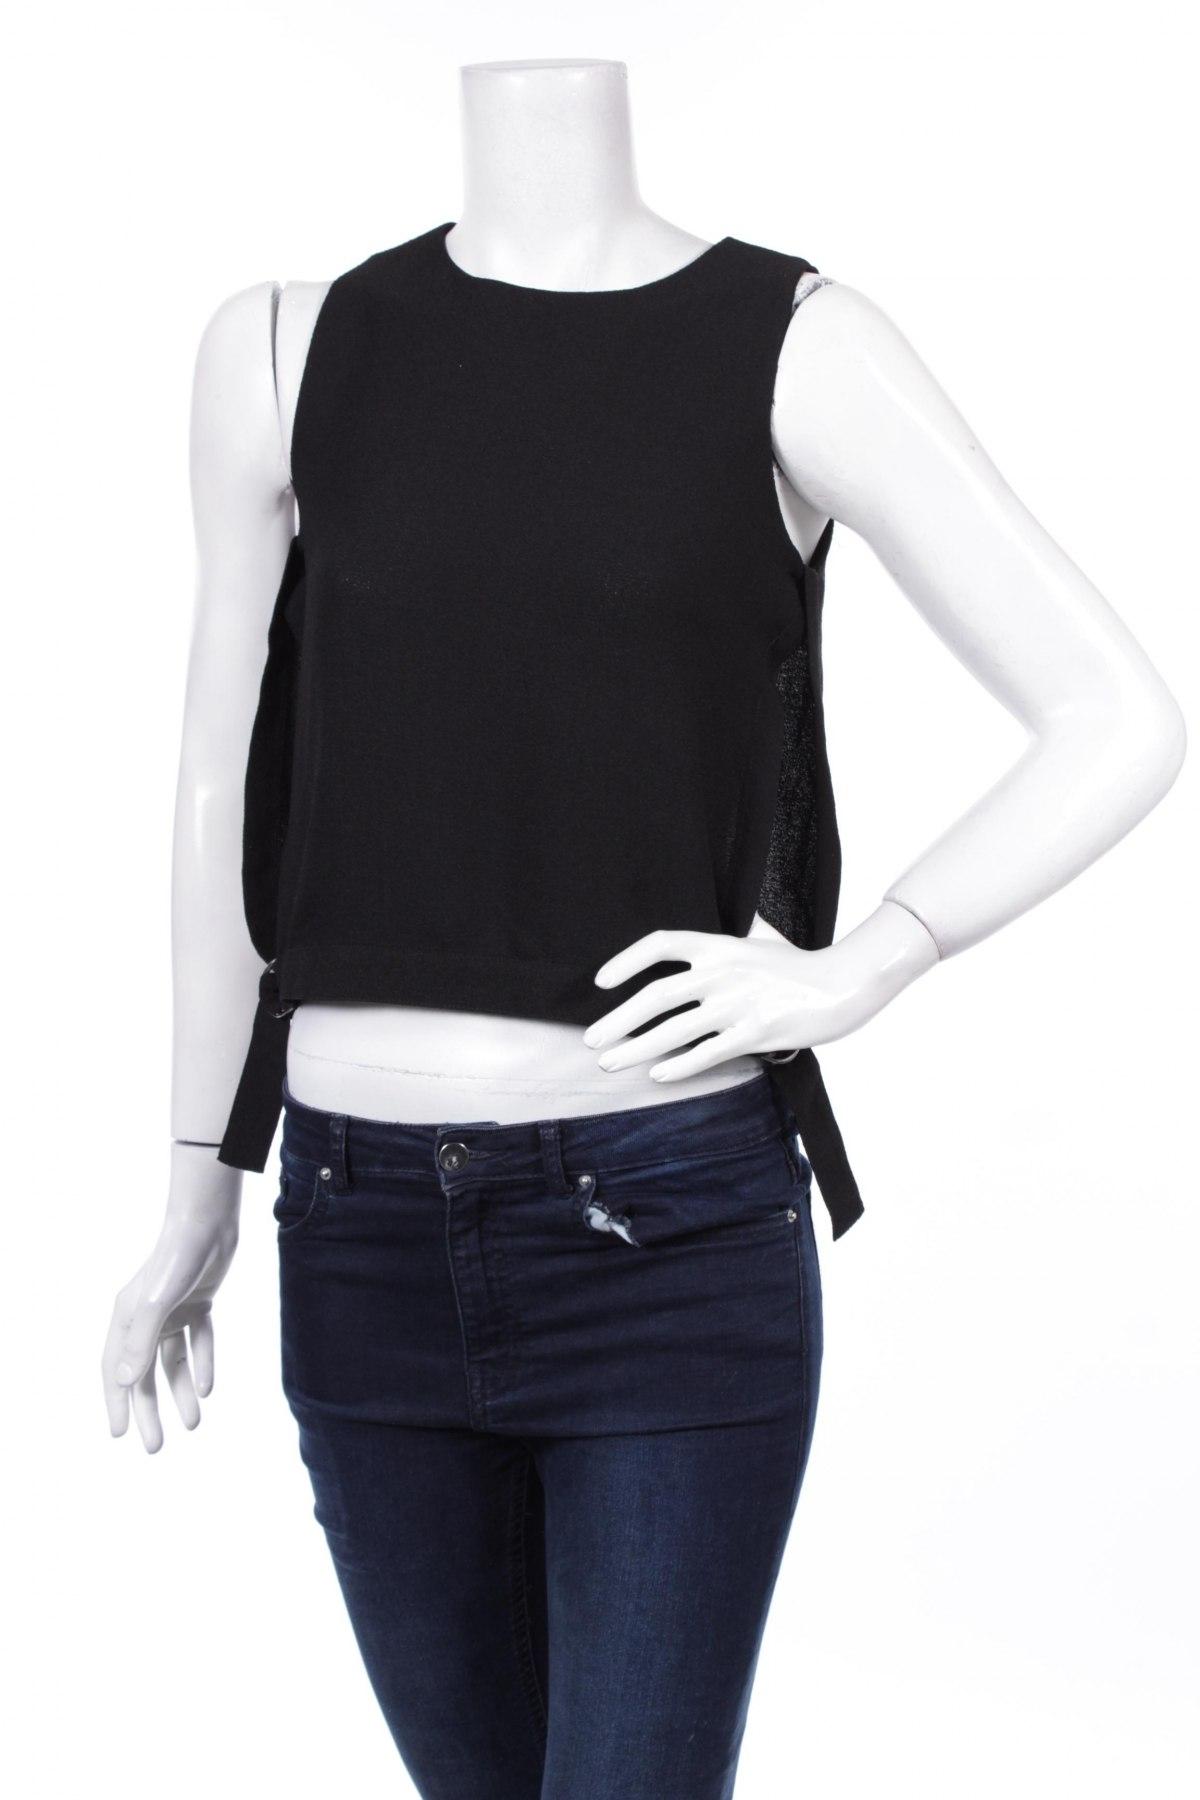 79532e364e5f Γυναικείο αμάνικο μπλουζάκι Vero Moda - σε συμφέρουσα τιμή στο Remix ...